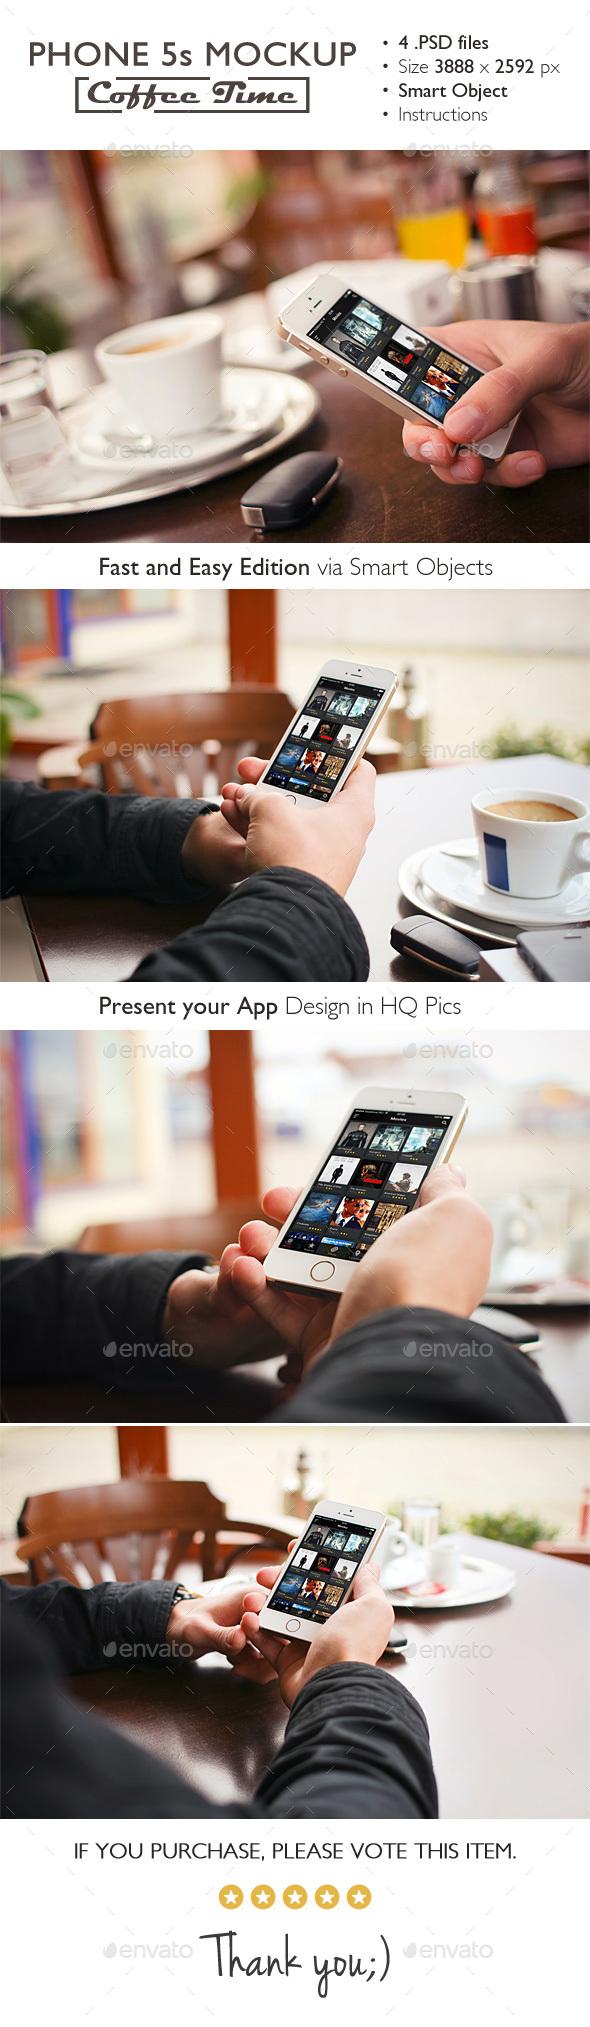 Phone 5s Mockup Coffee Time - Mobile Displays